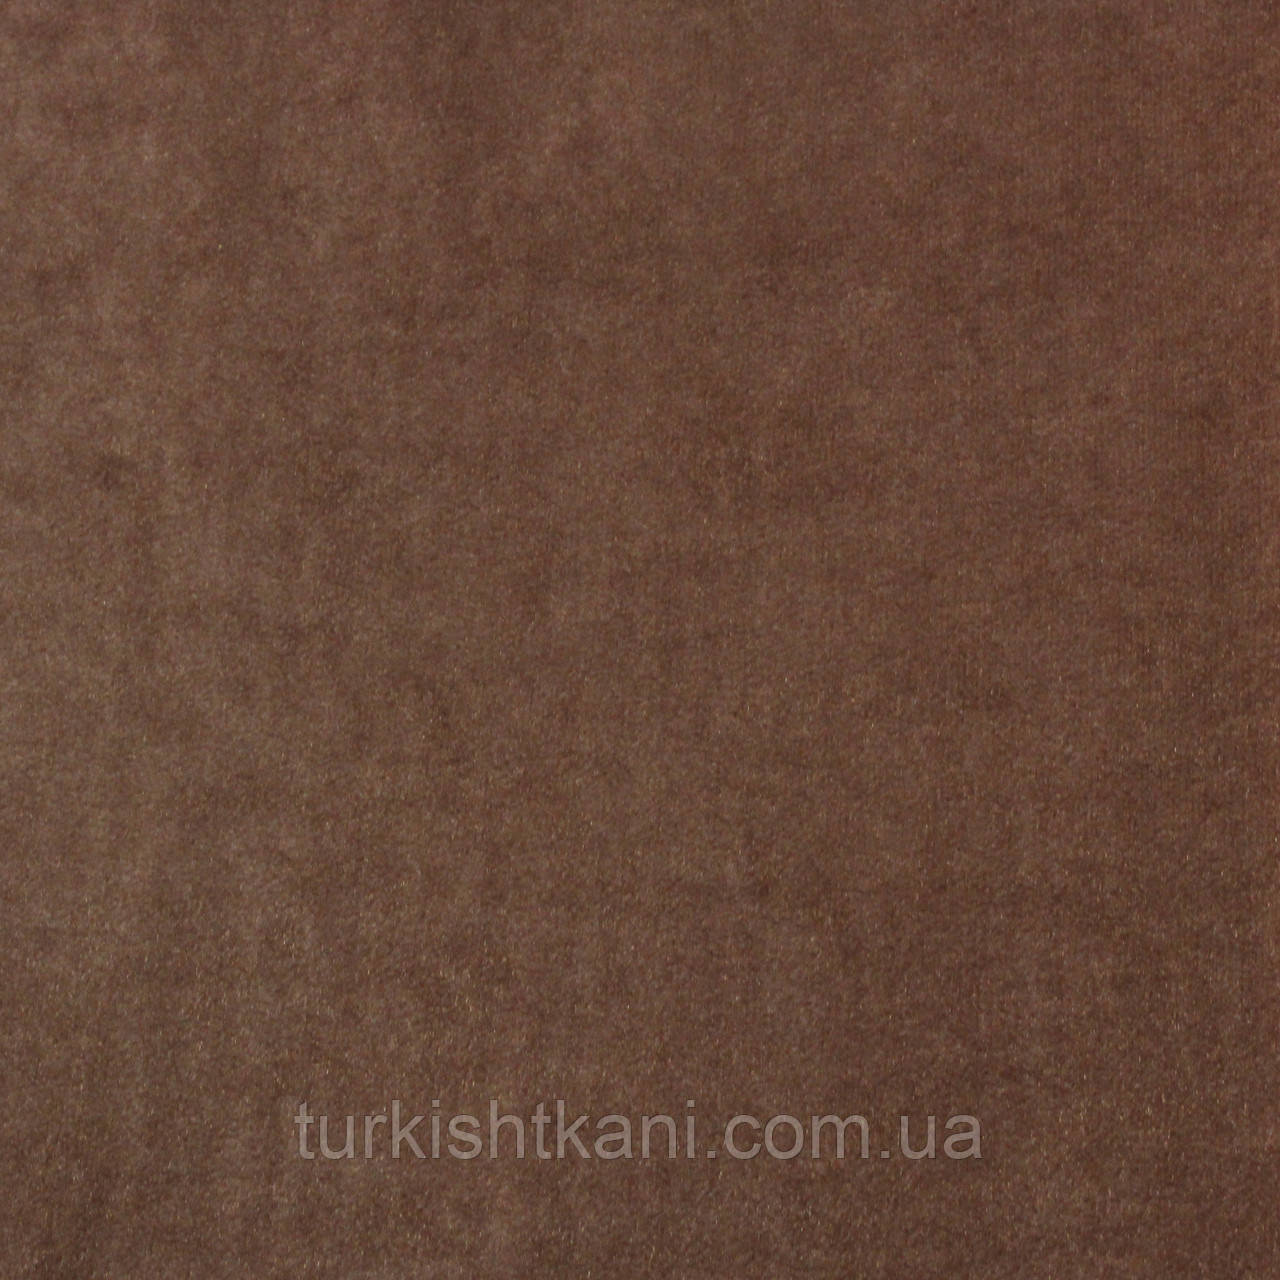 Ткань  Замша на Трикотаже